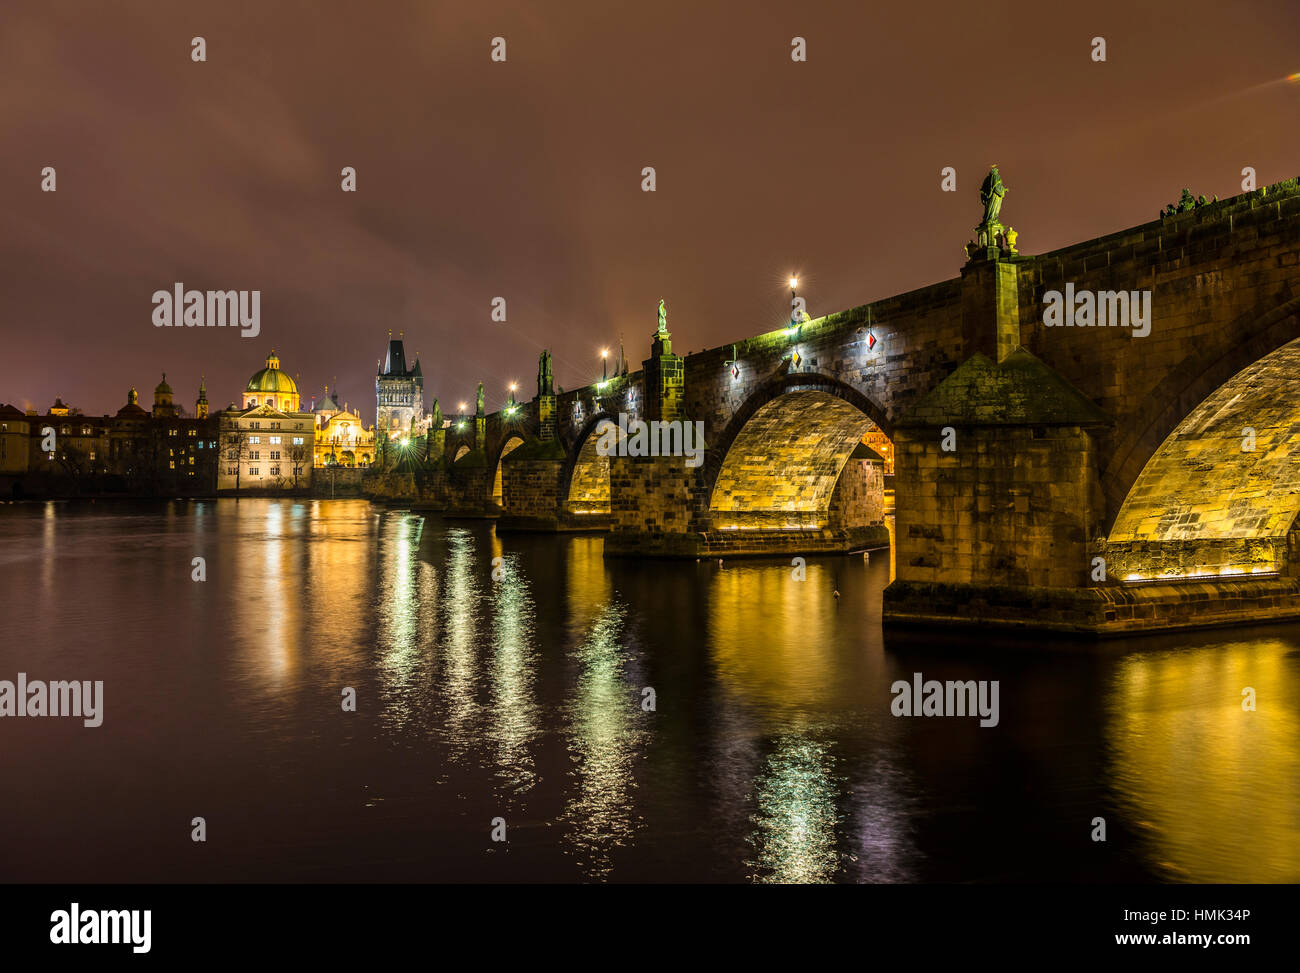 Moldau, Karlsbrücke, Brückenturm, Nachtszene, Altstadt, Prag, Böhmen, Tschechische Republik Stockbild